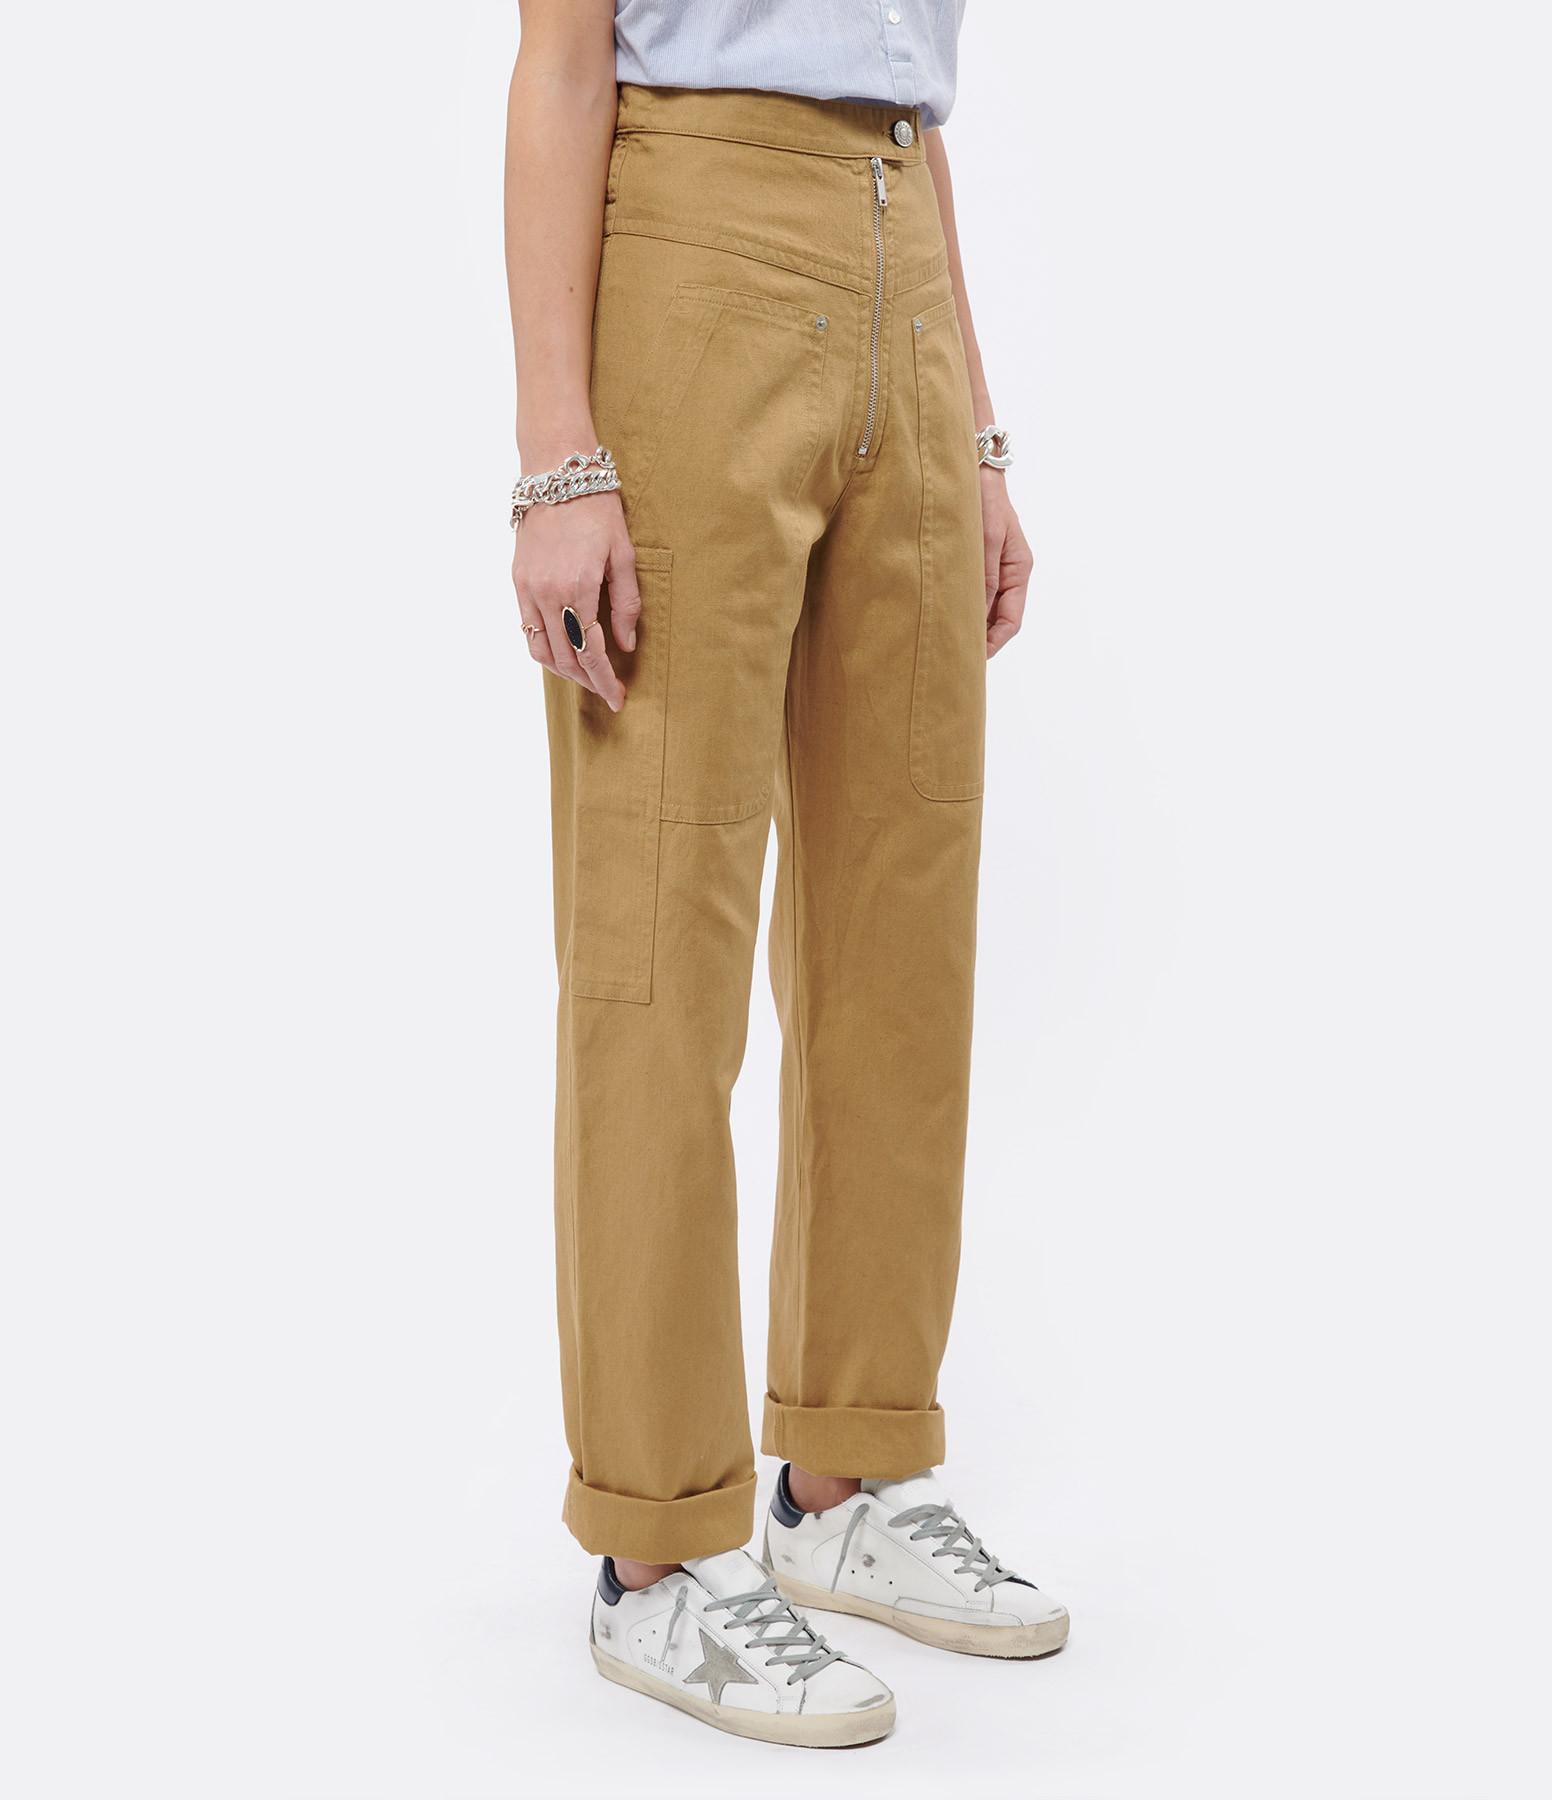 ISABEL MARANT ÉTOILE - Pantalon Phil Coton Lin Camel